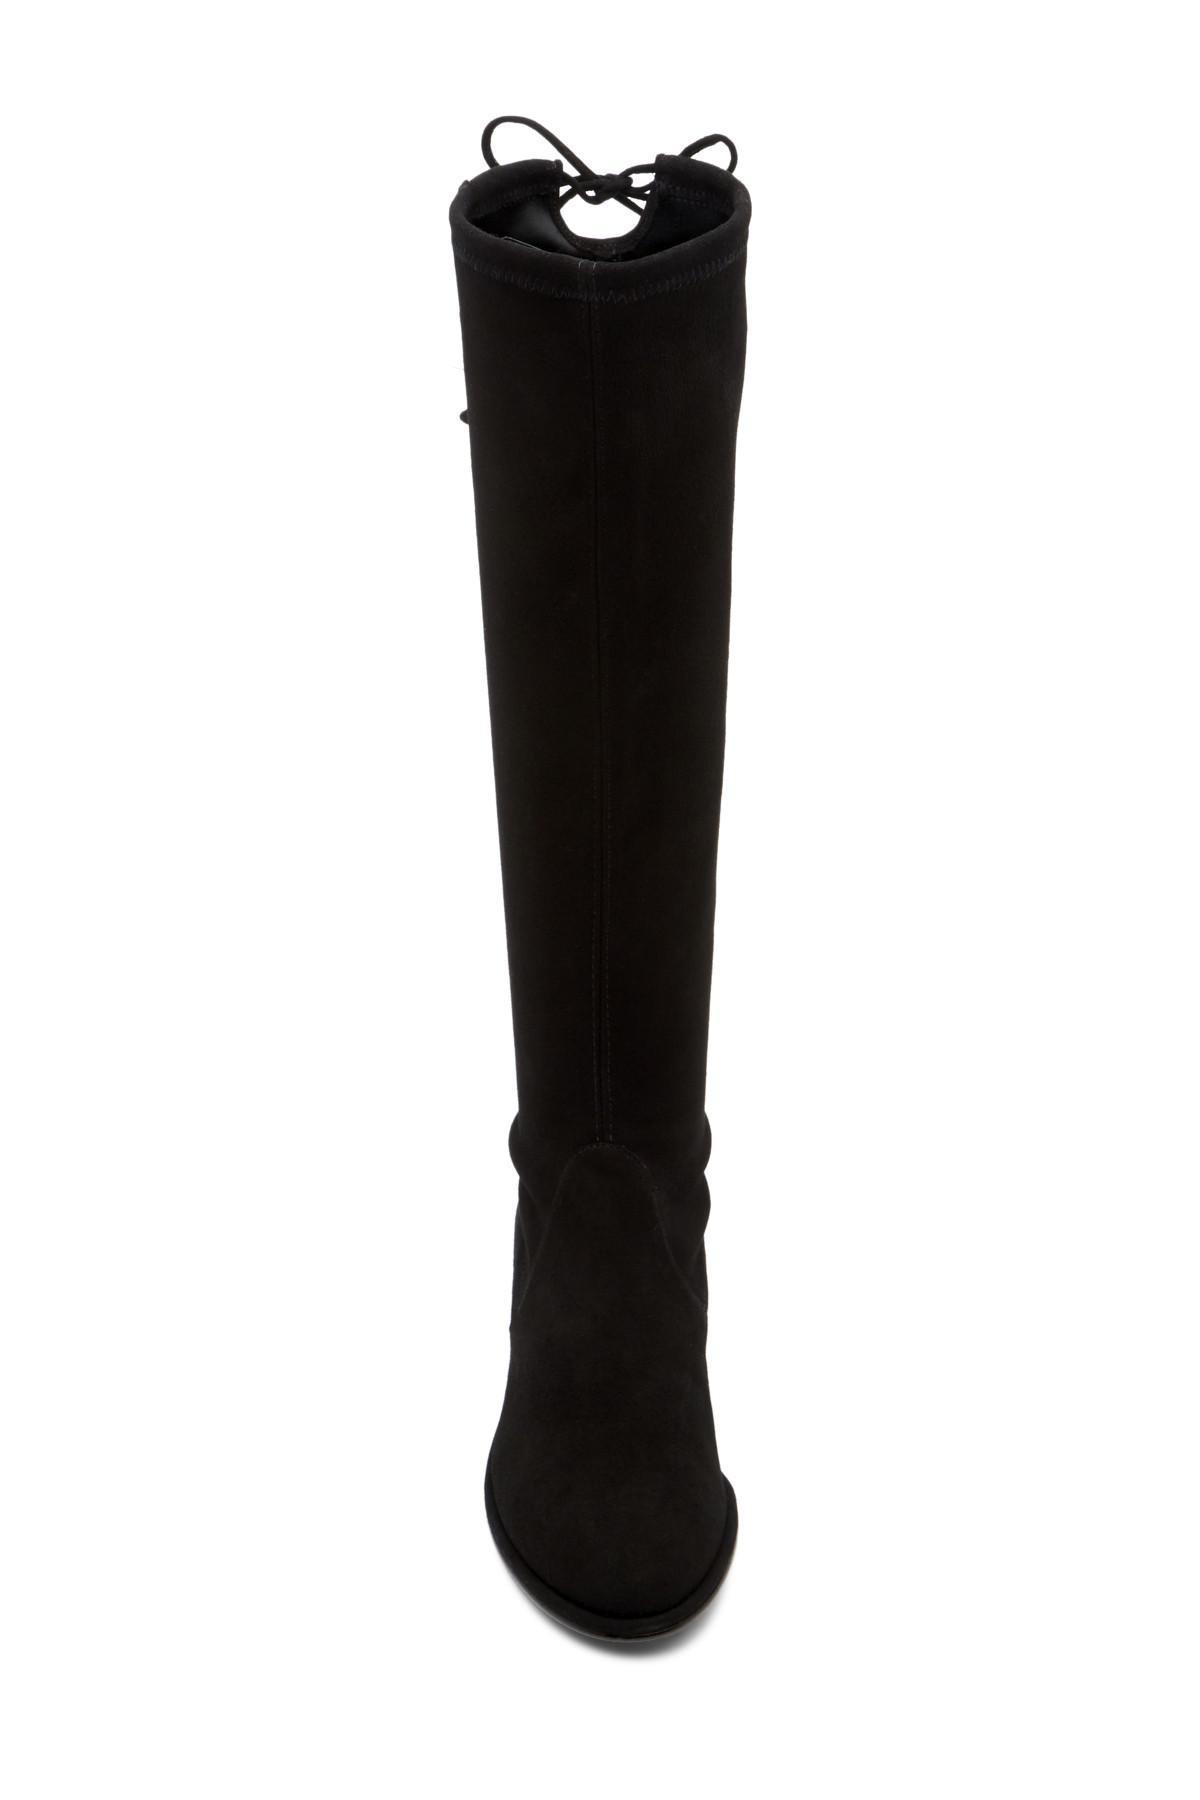 7f57ce73ad5 Lyst - Stuart Weitzman Kneezie Boot in Black